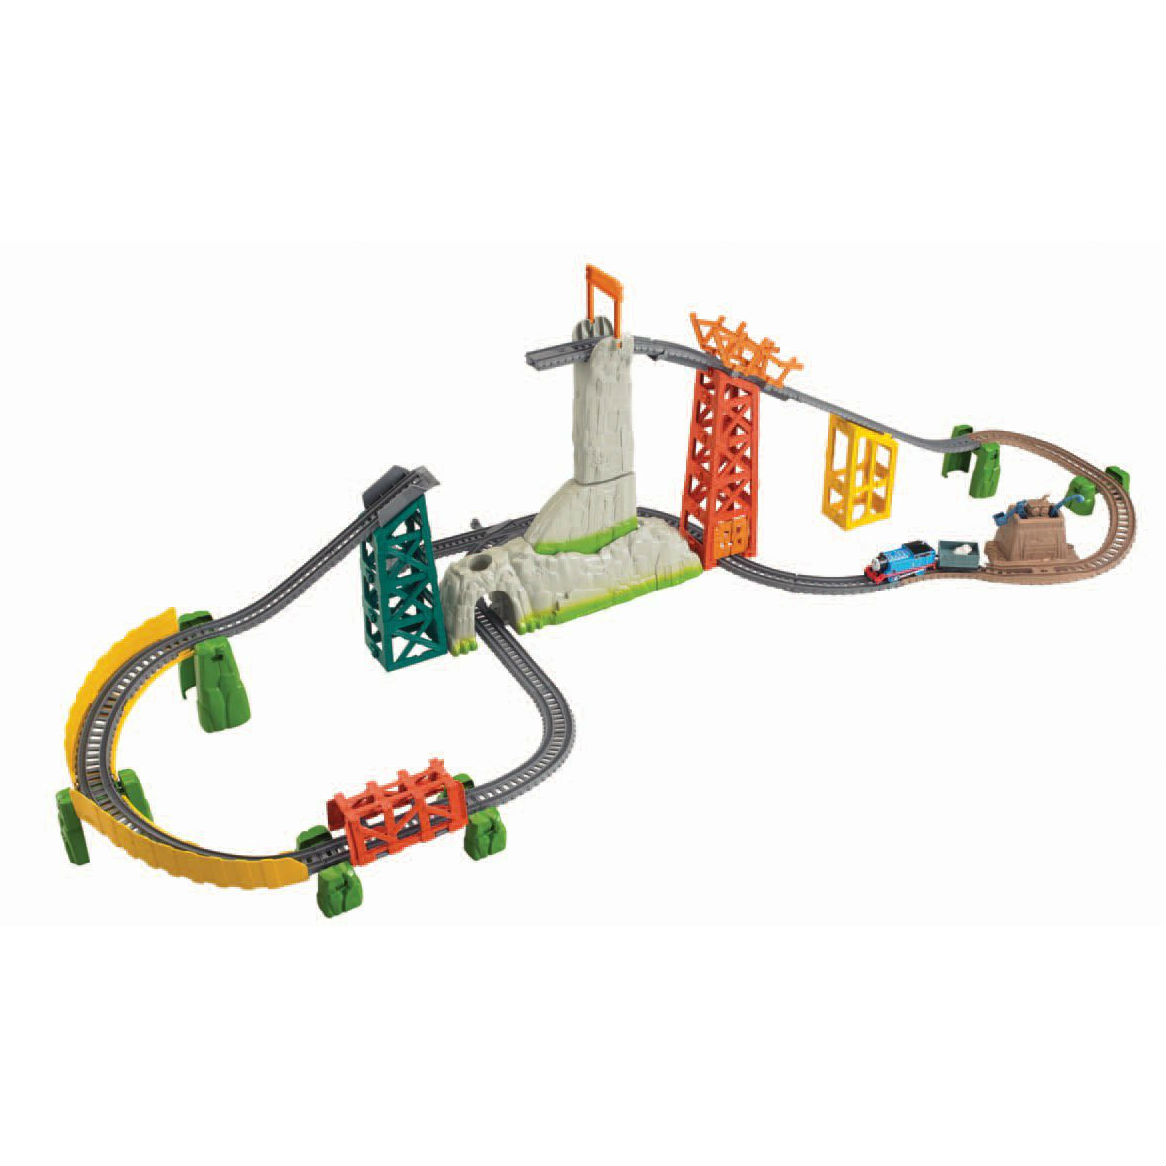 Avalanche Escape Trackmaster Set Best Educational Infant Toys